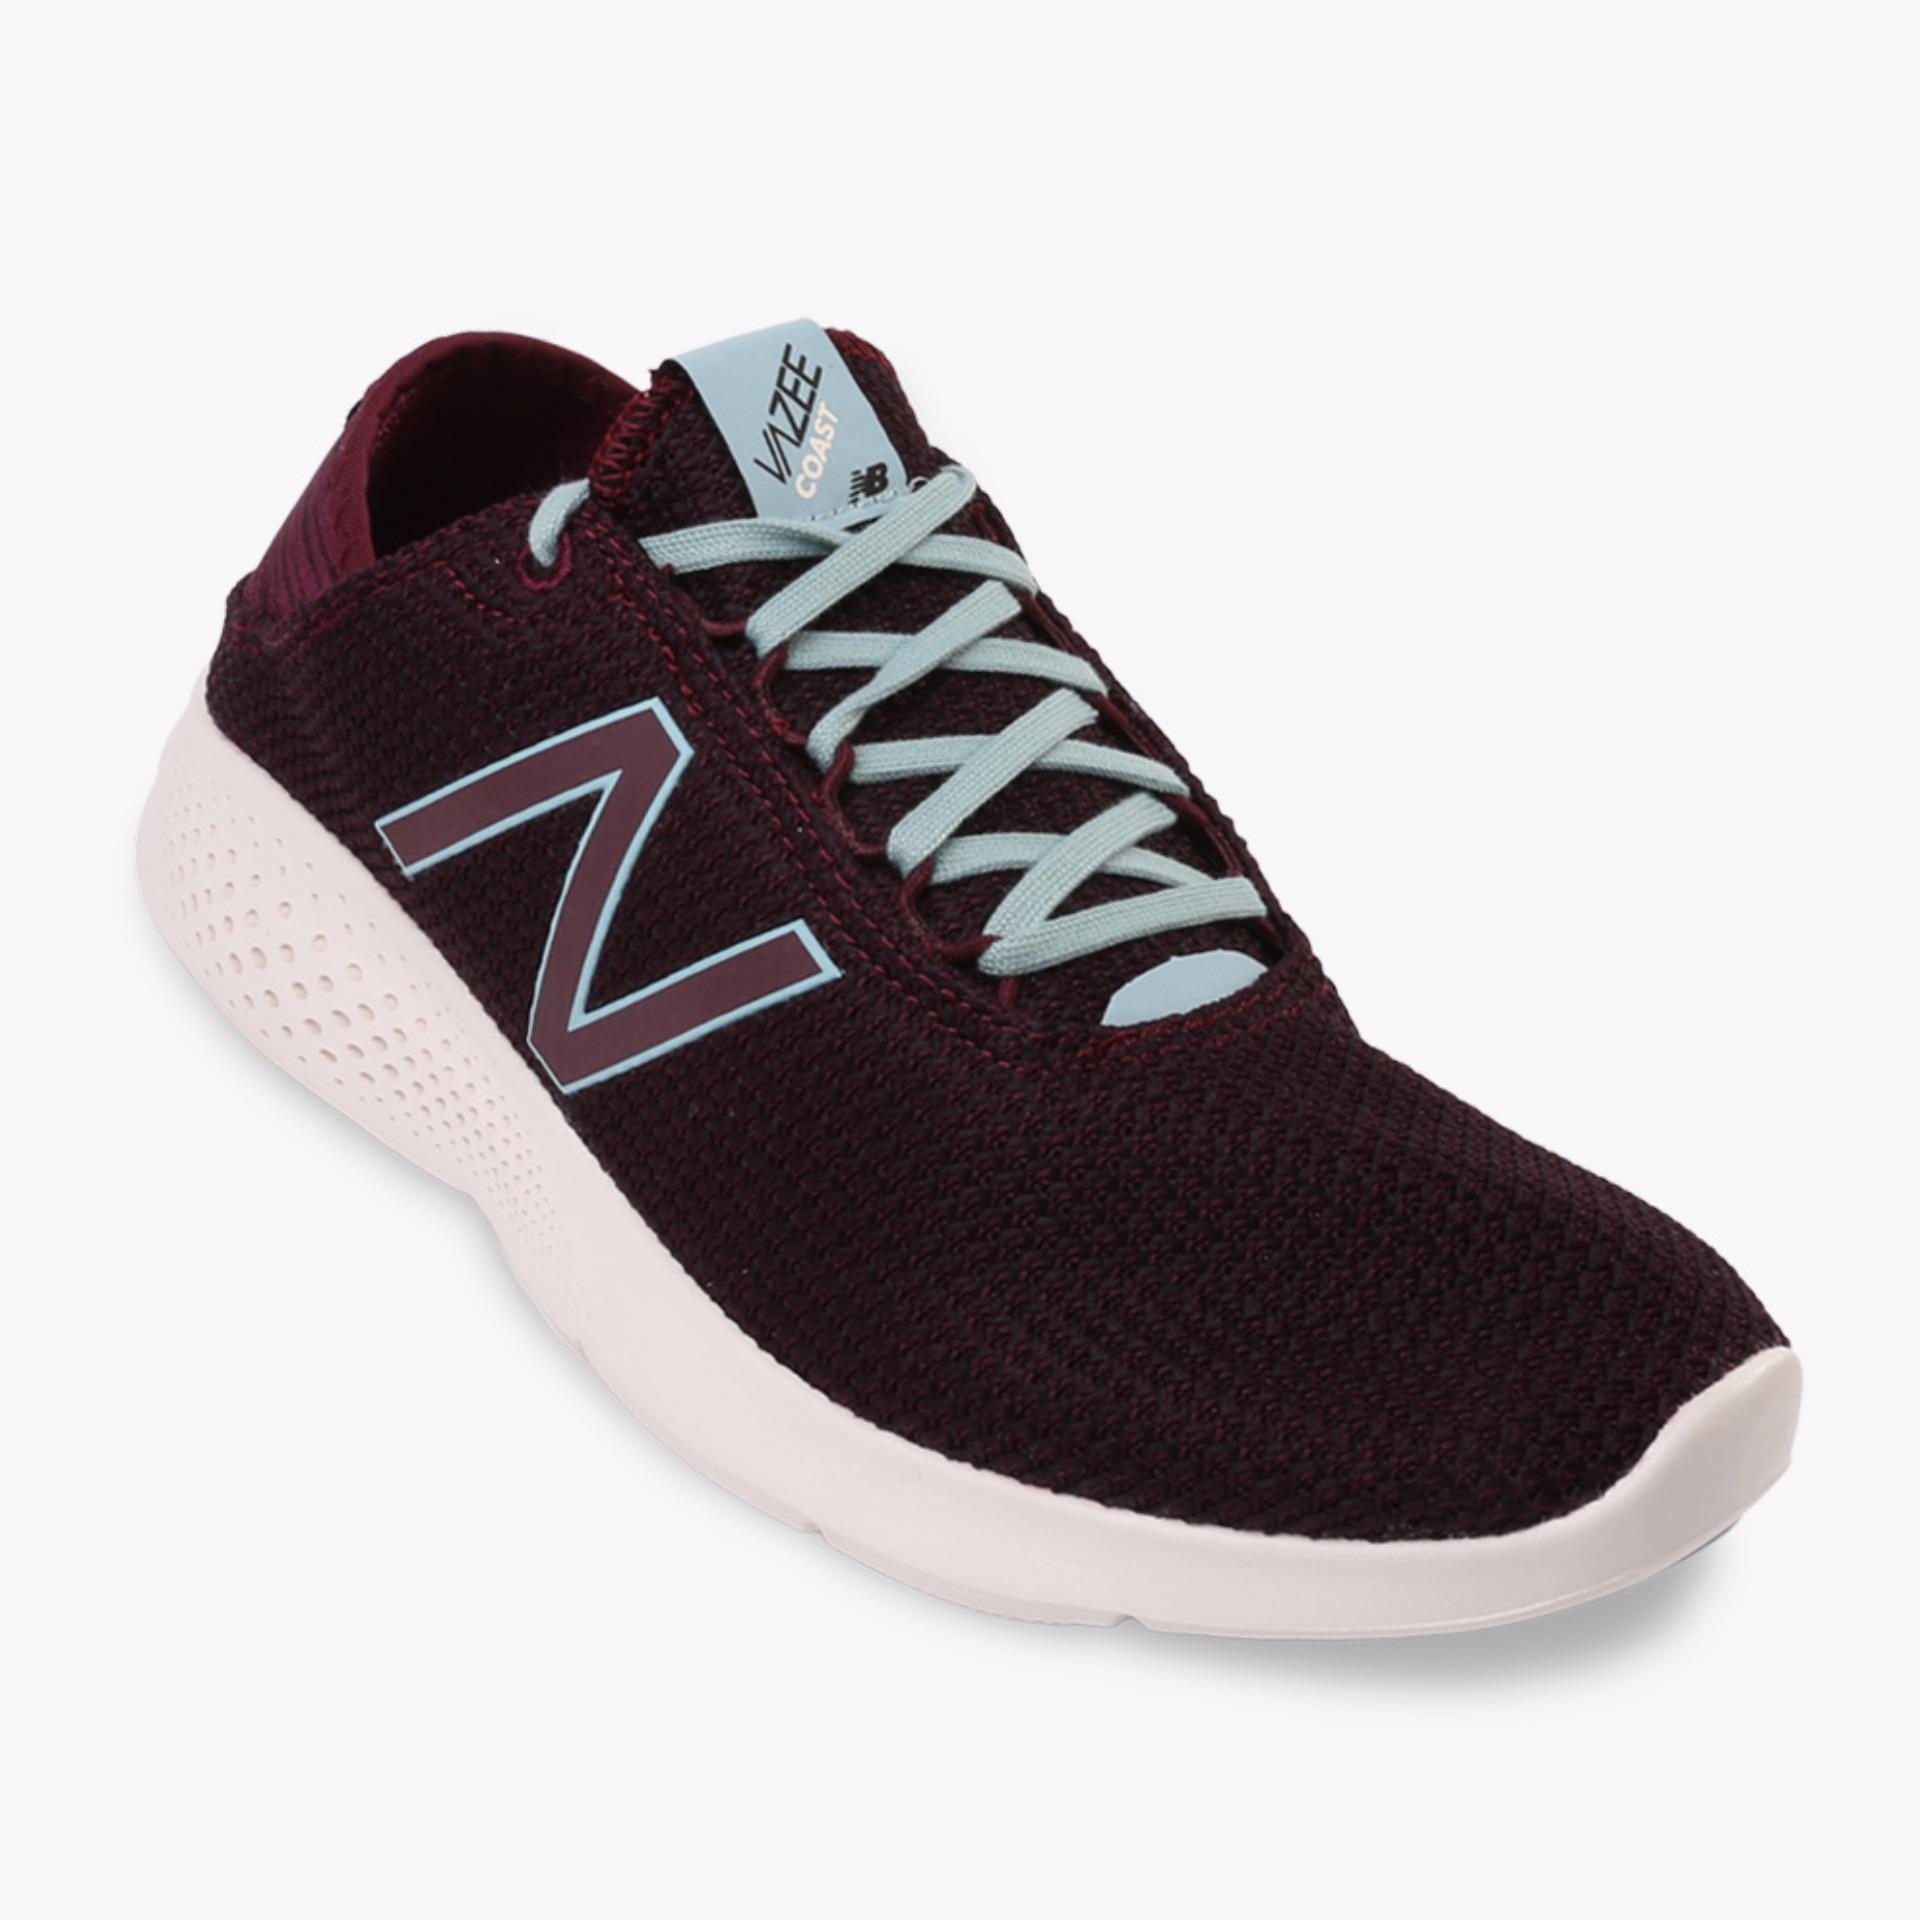 Harga New Balance Vazee Coast V2 Women S Shoes Burgundy Dan Spesifikasinya